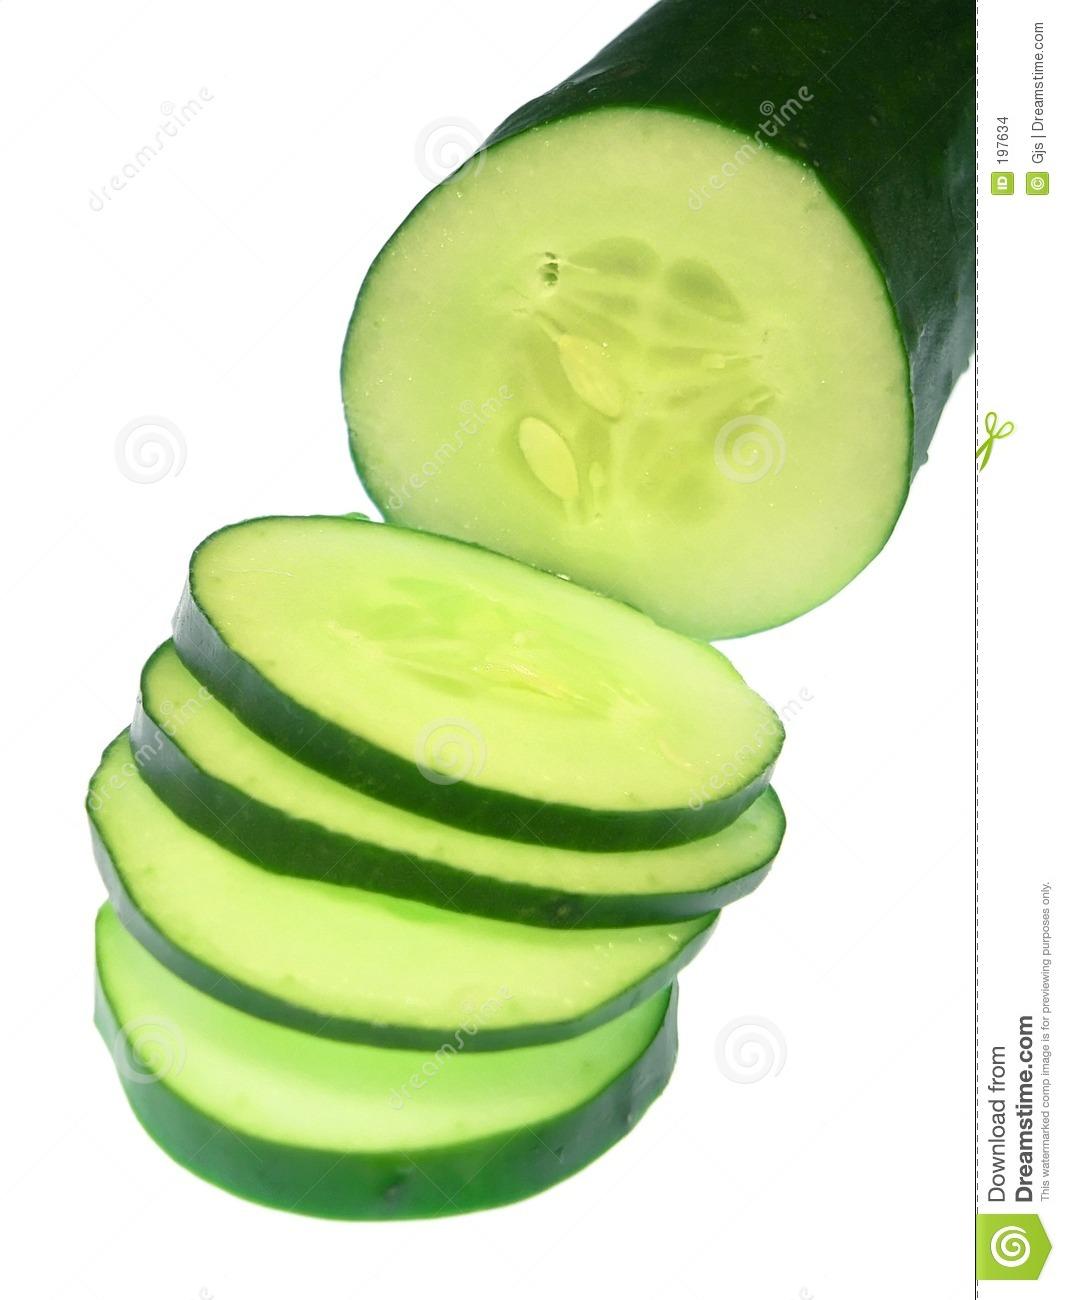 Green cucumbers clipart.